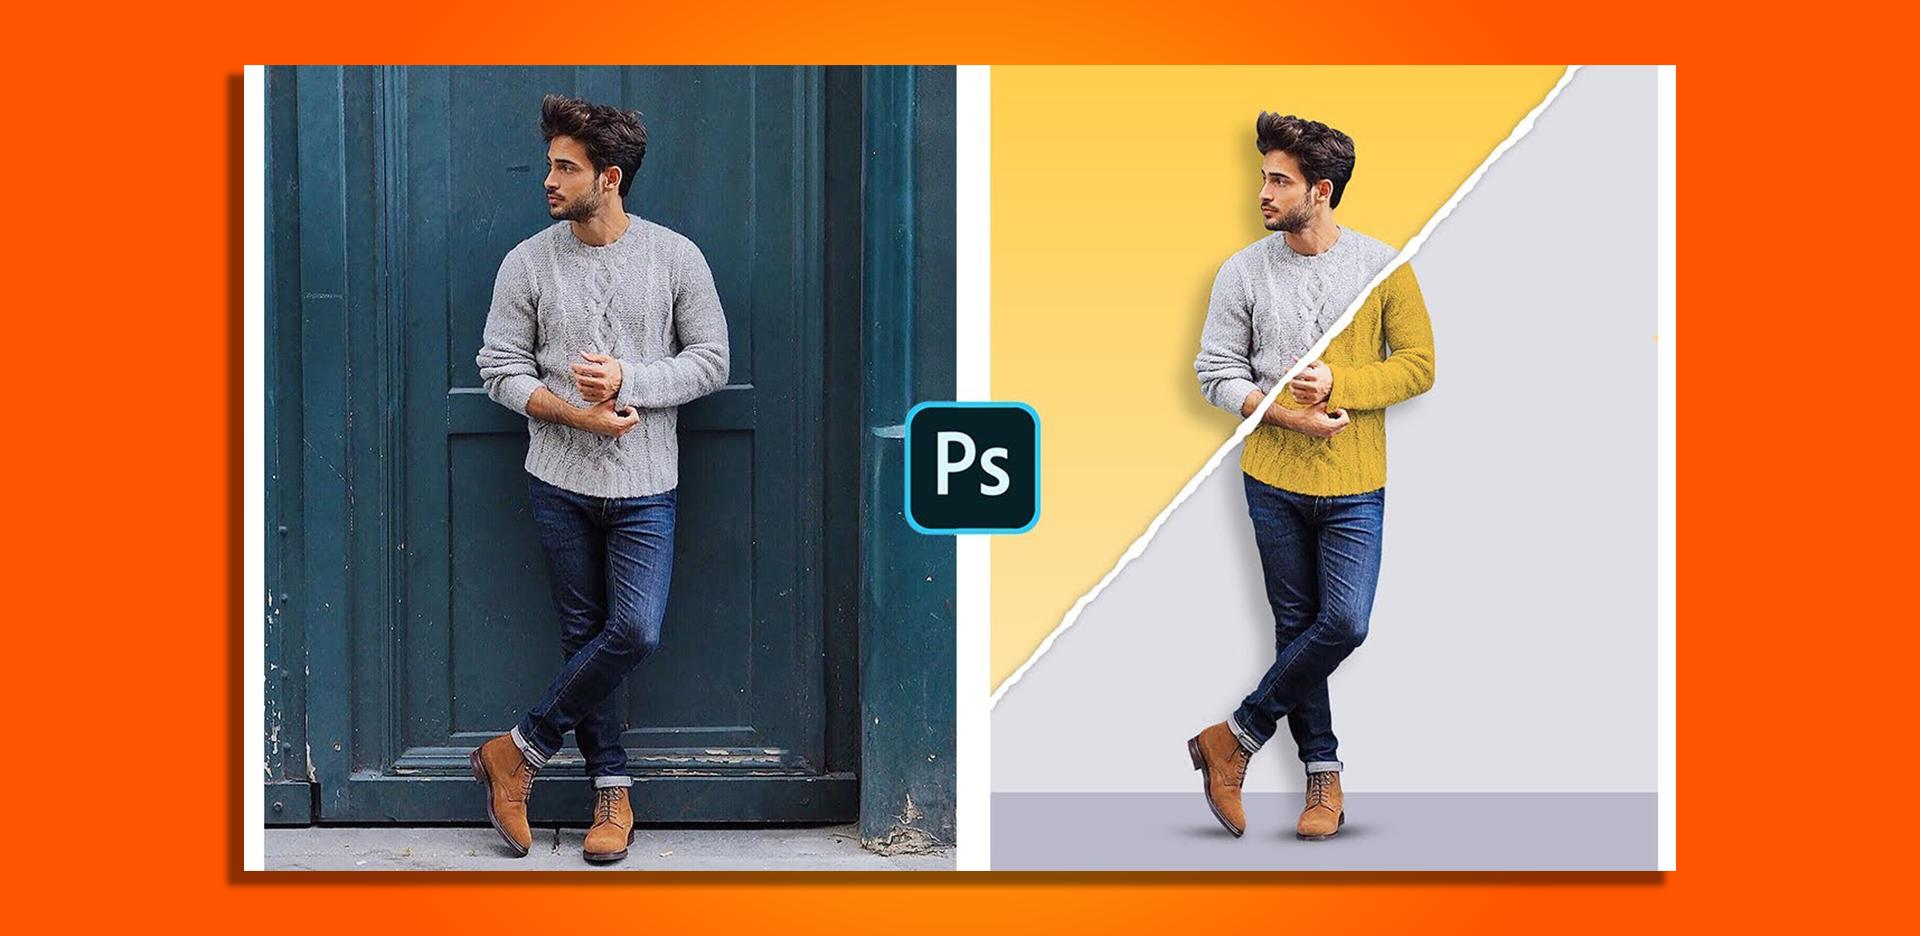 Professional Photoshop Editing and Photo Retouching